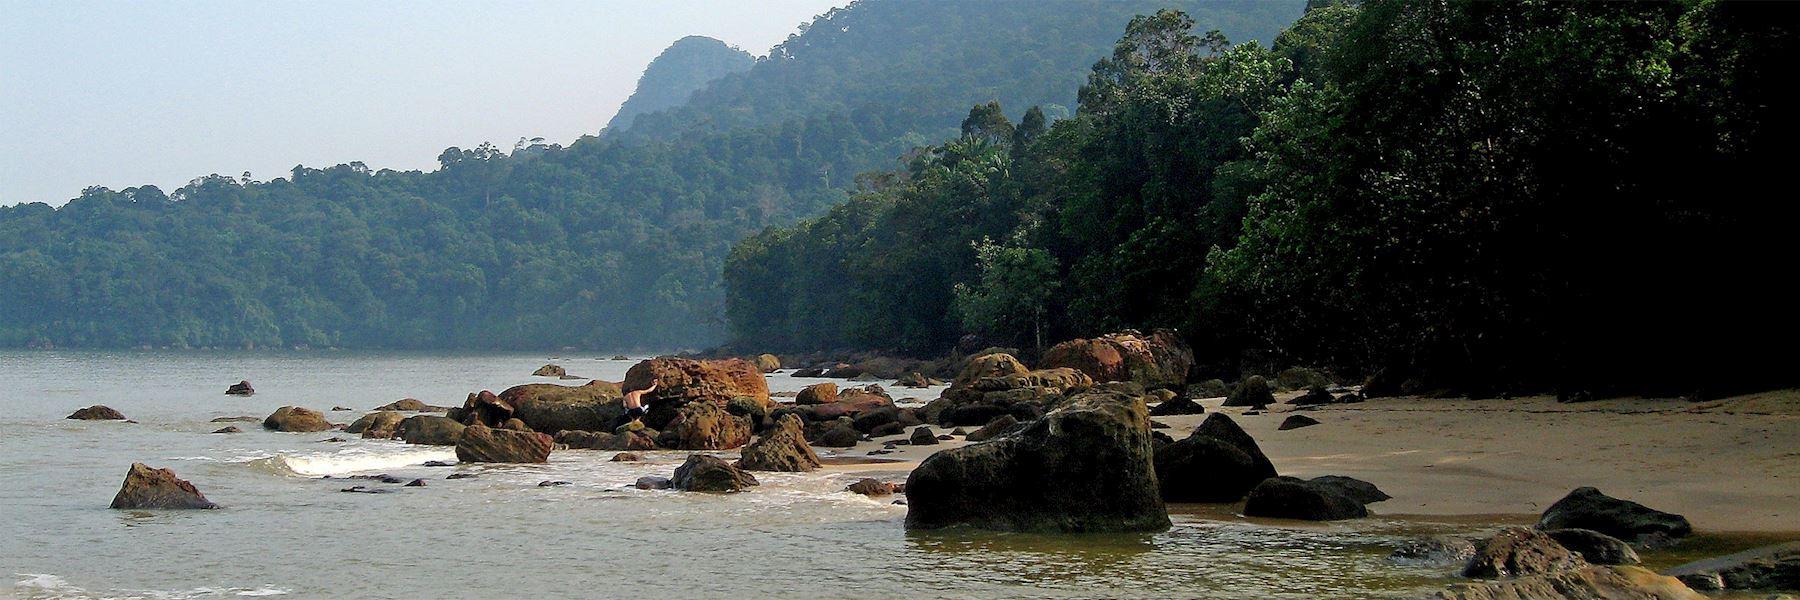 Visit Santubong, Borneo